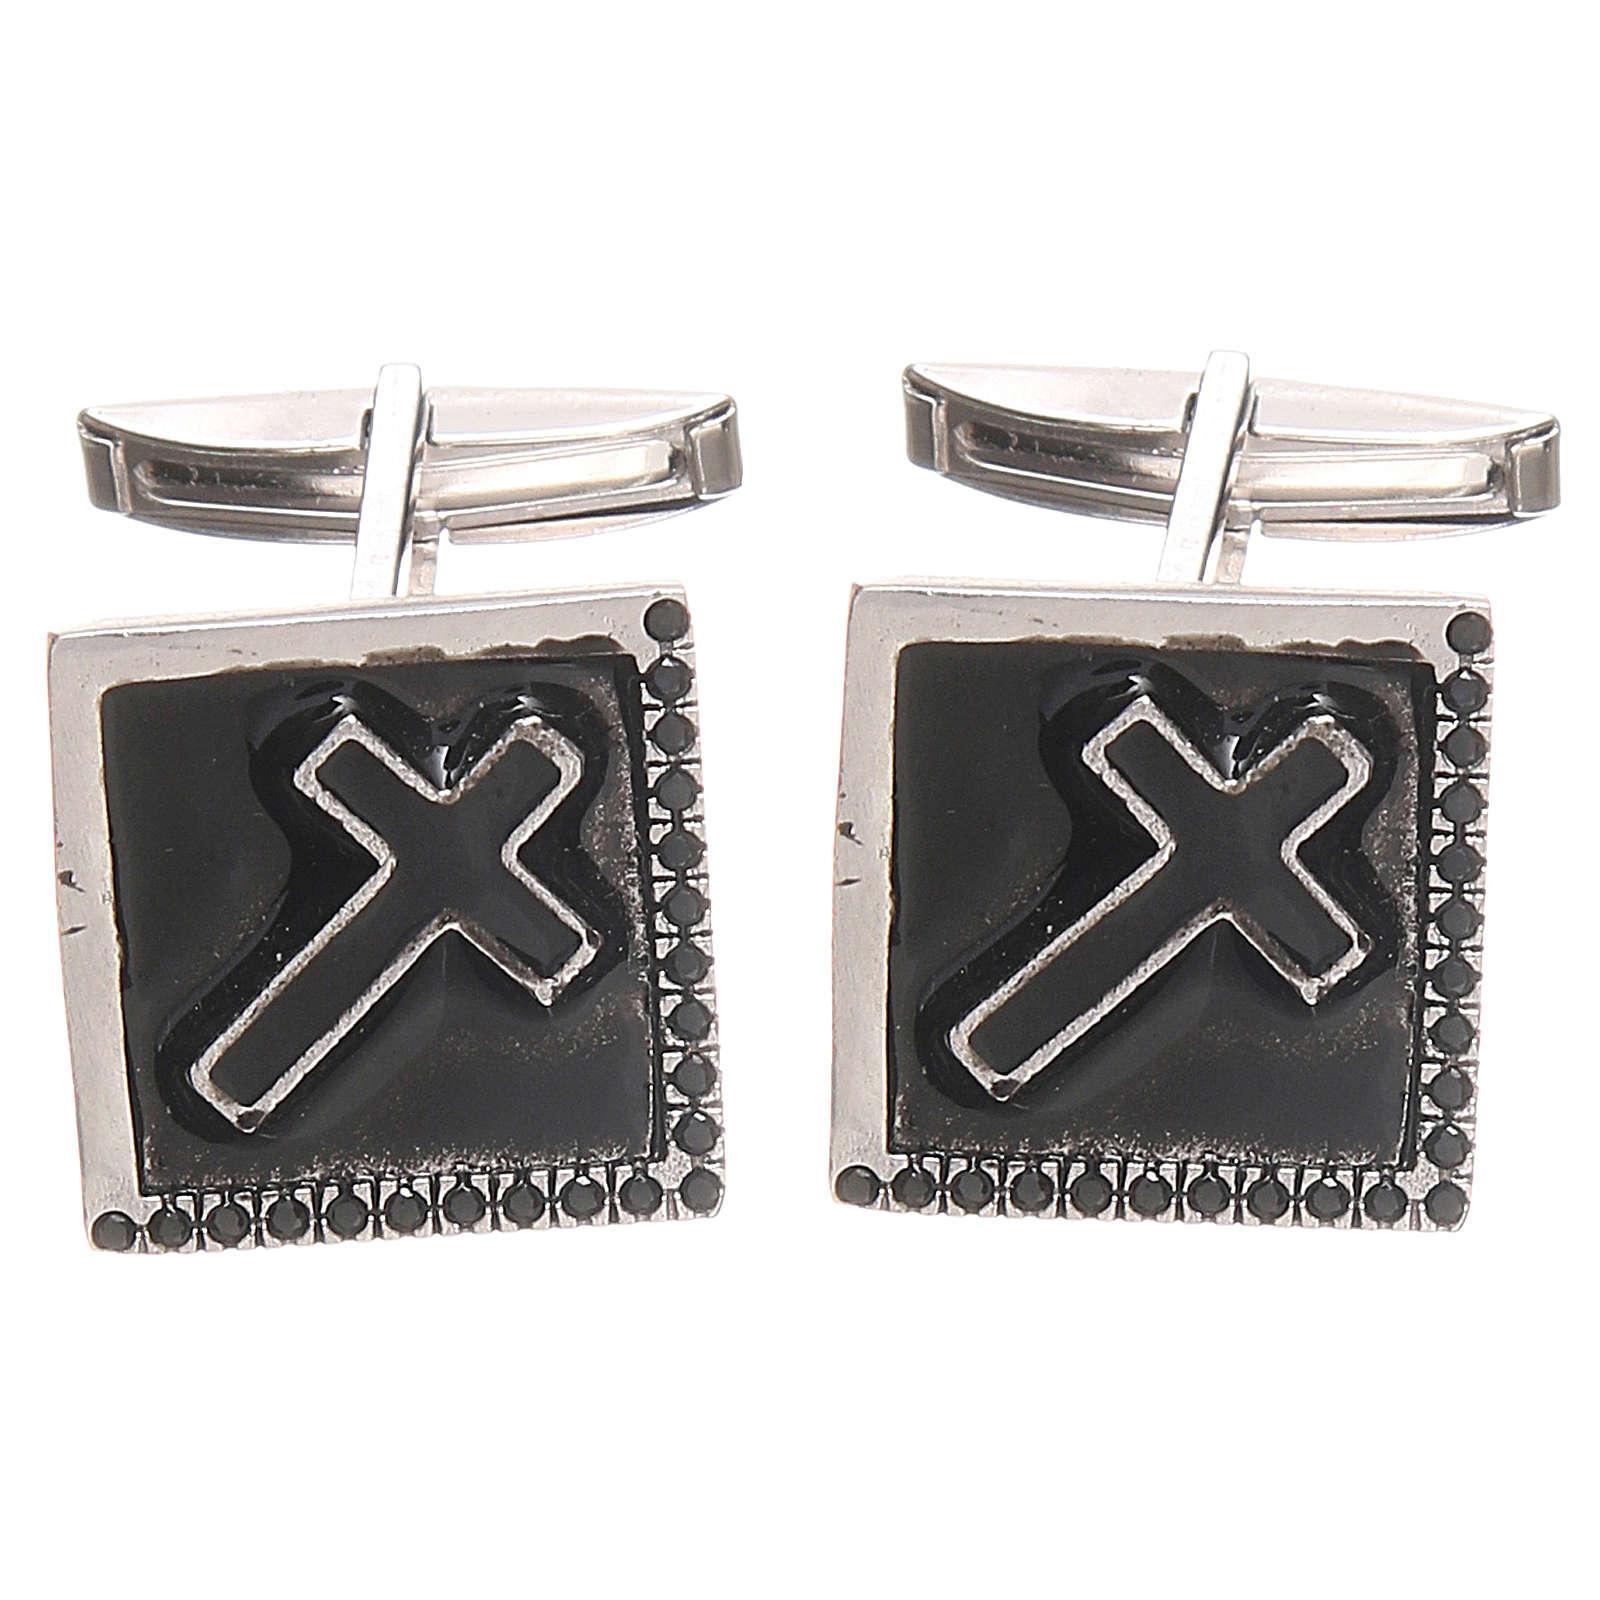 Gemelli in argento 800 Croce 1,6x1,6 cm 4